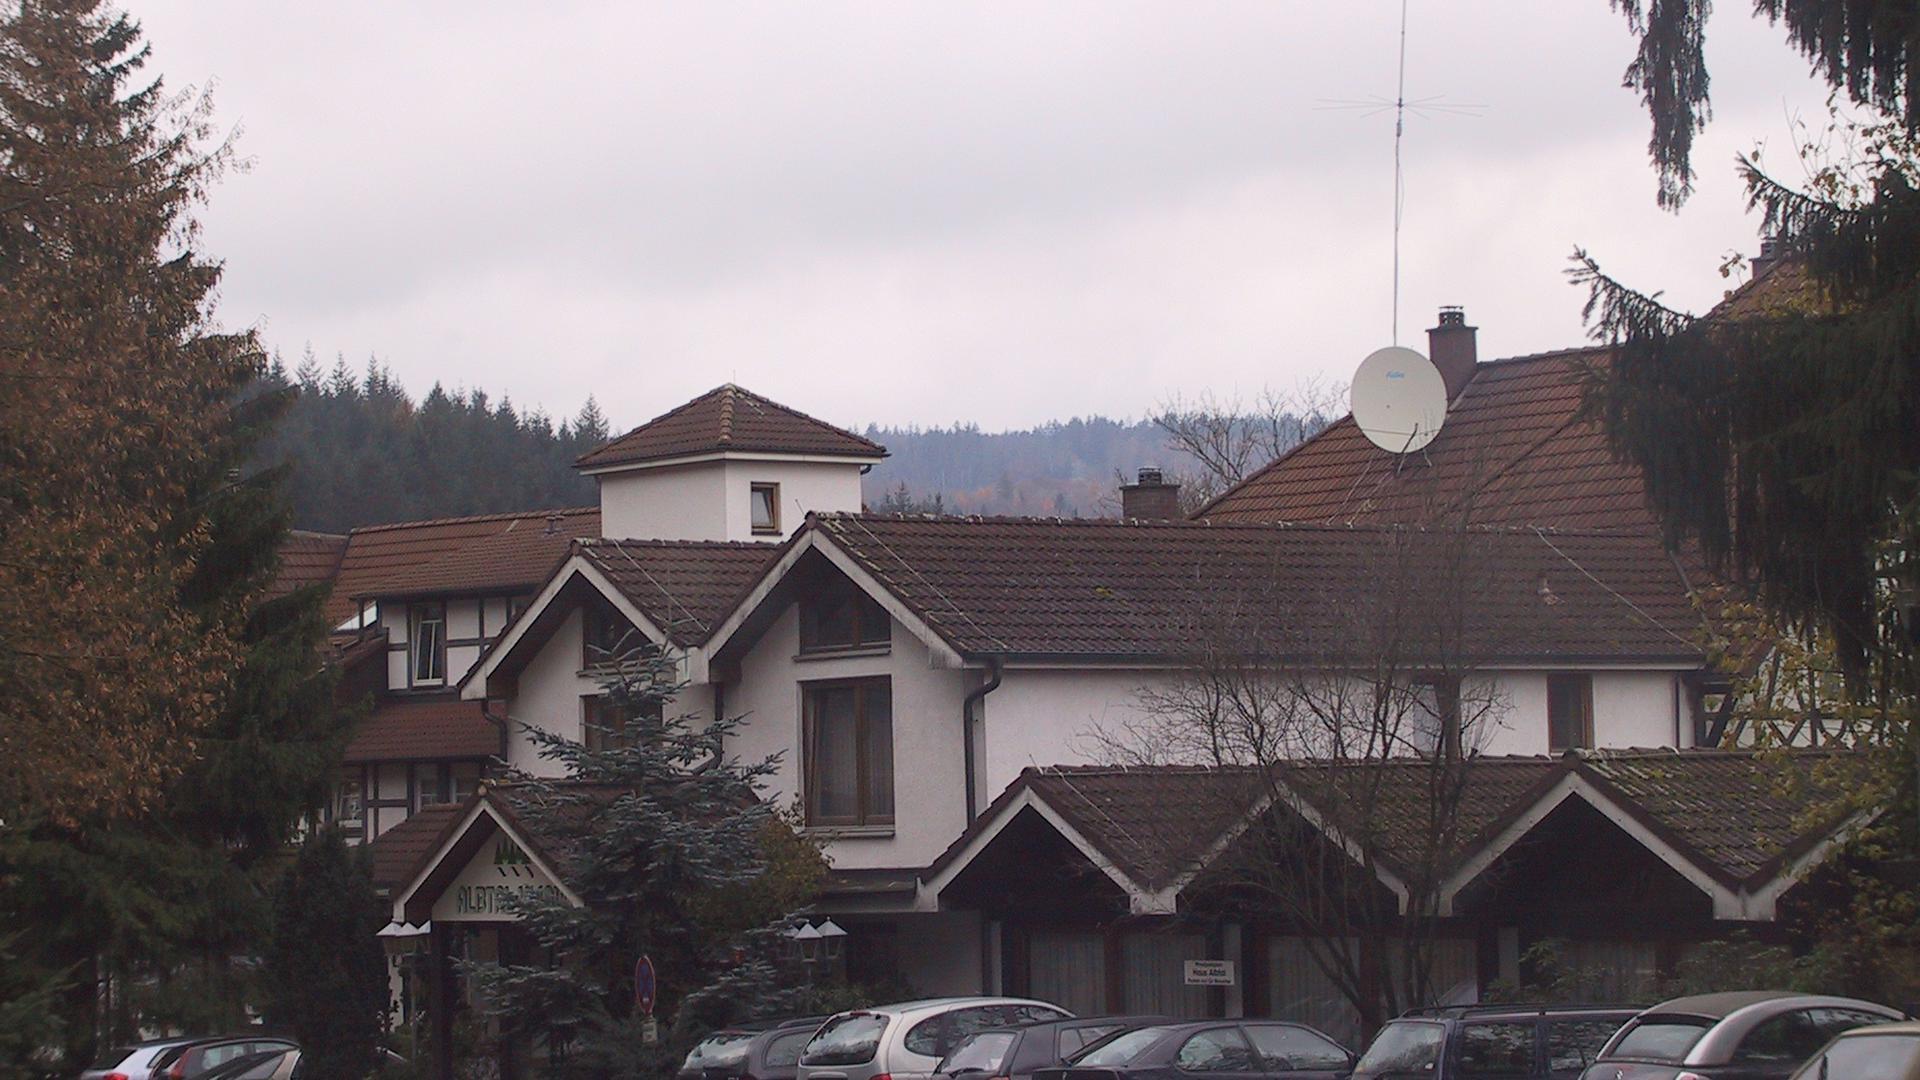 Albtal-Klinik Marxzell, Gebäude